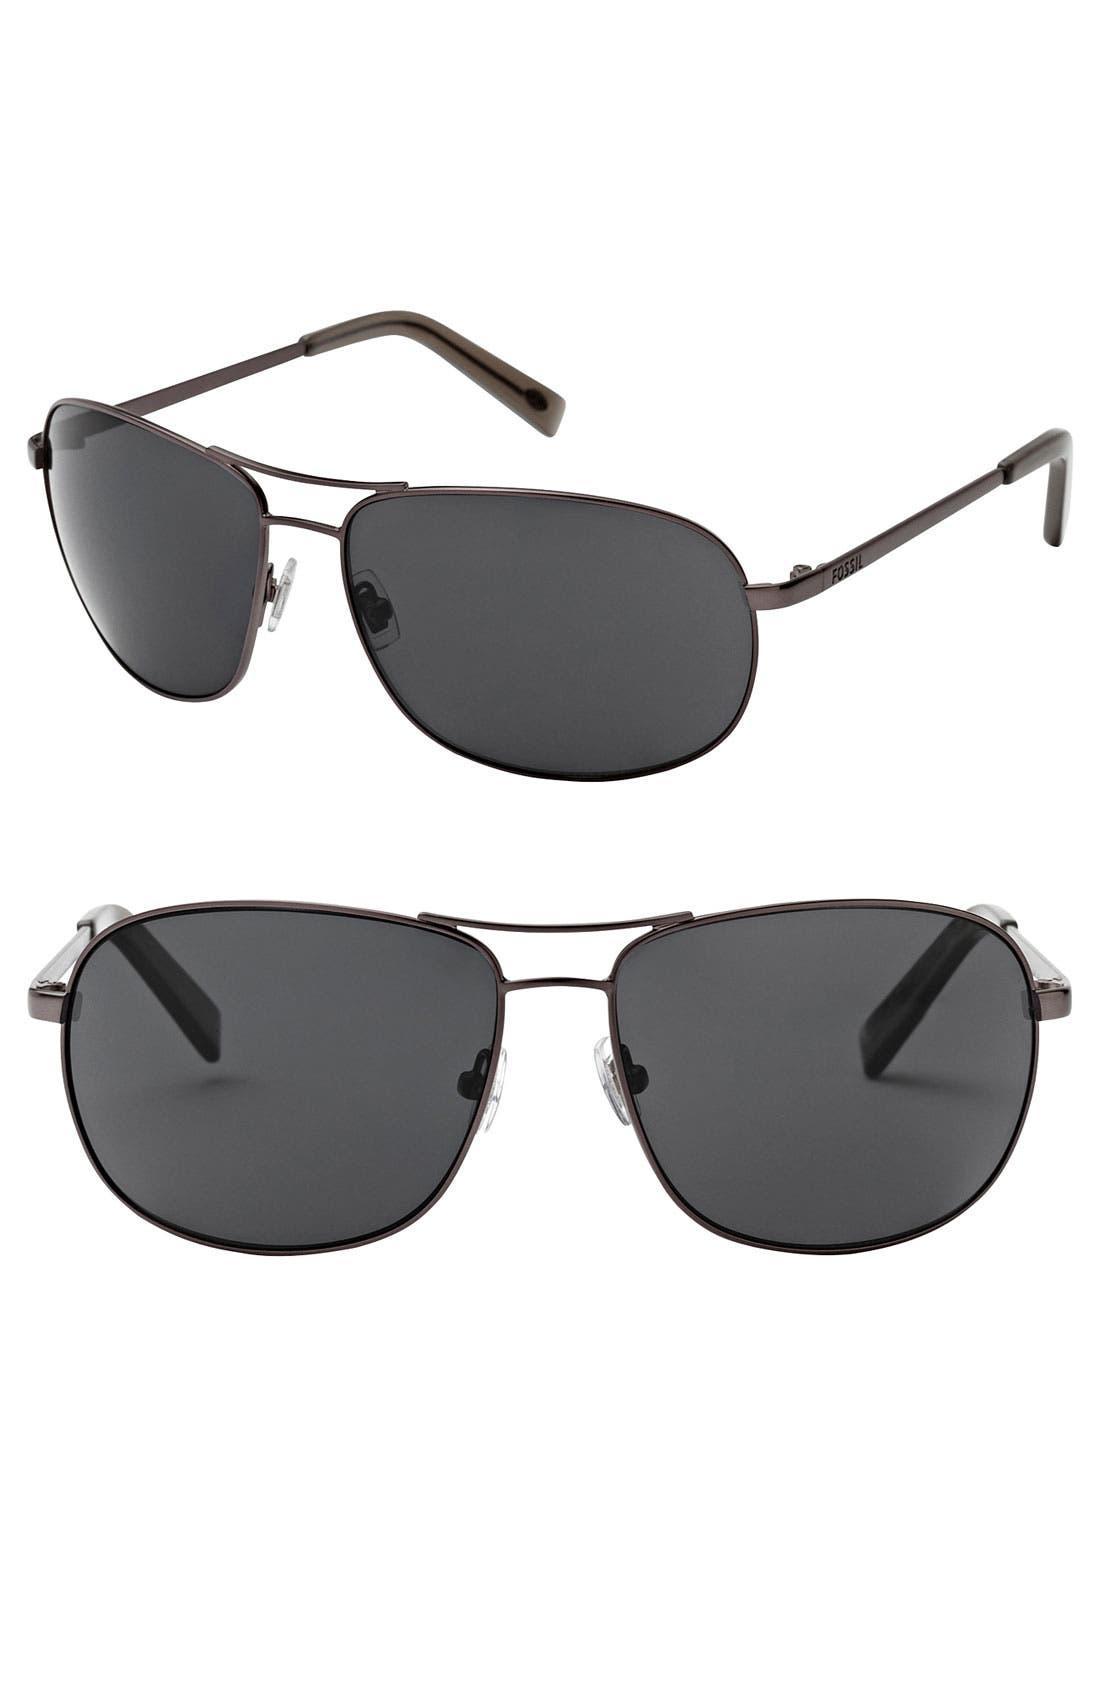 Main Image - Fossil 'Dylan' 62mm Aviator Sunglasses